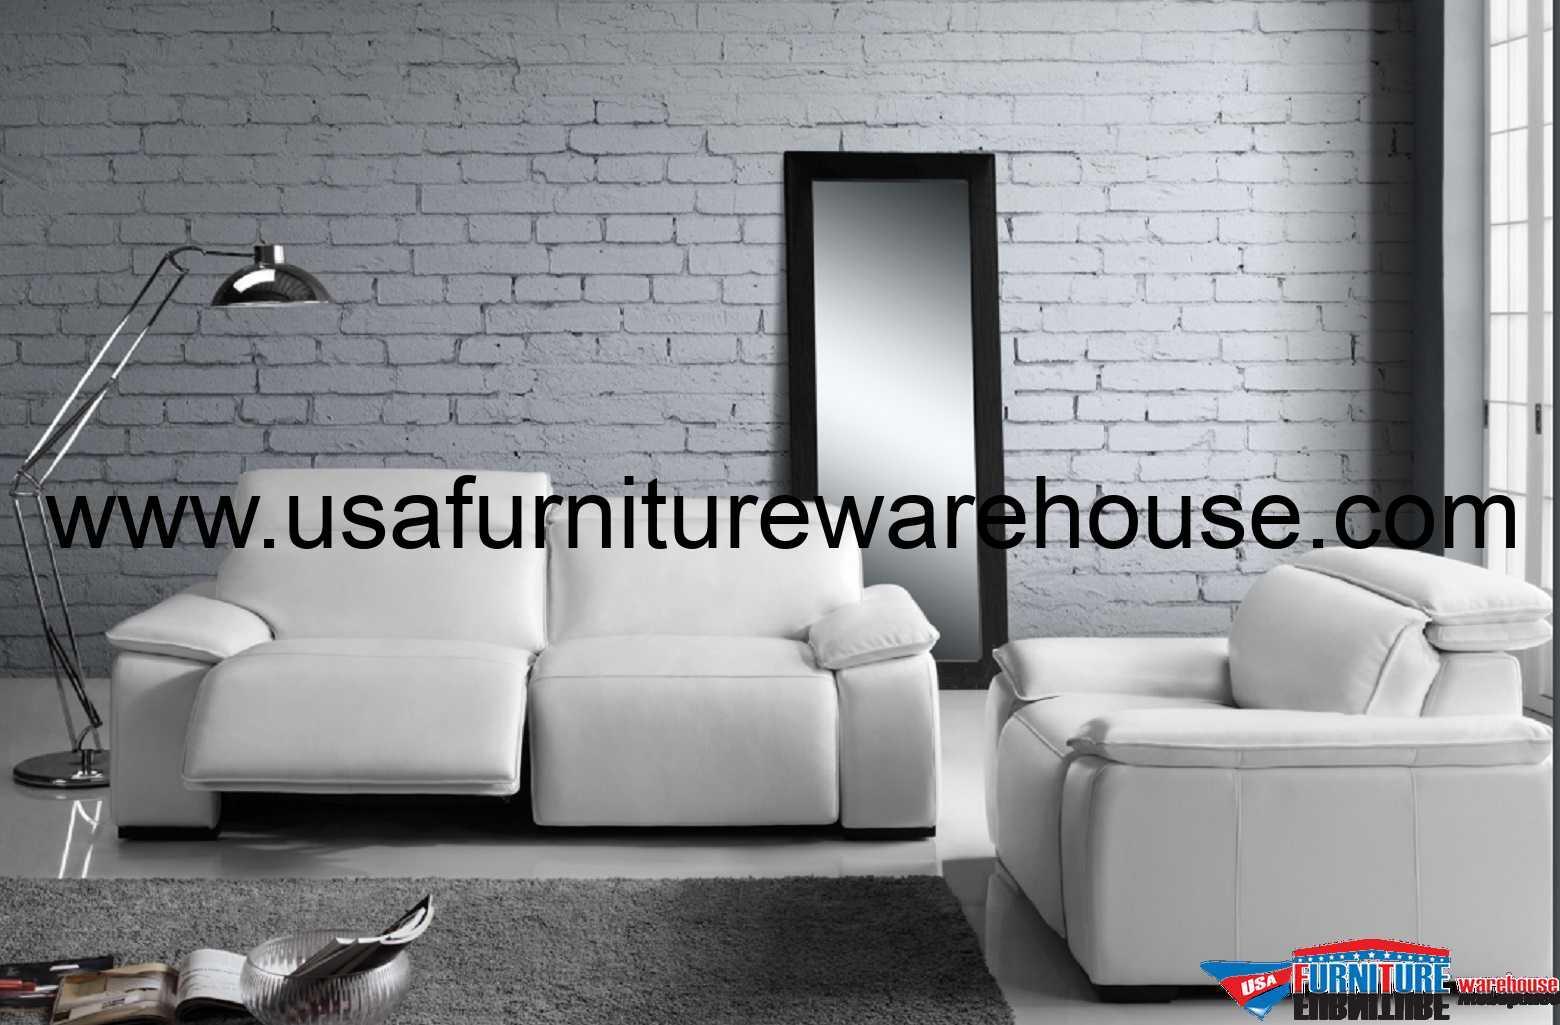 Gentil USA Furniture Warehouse